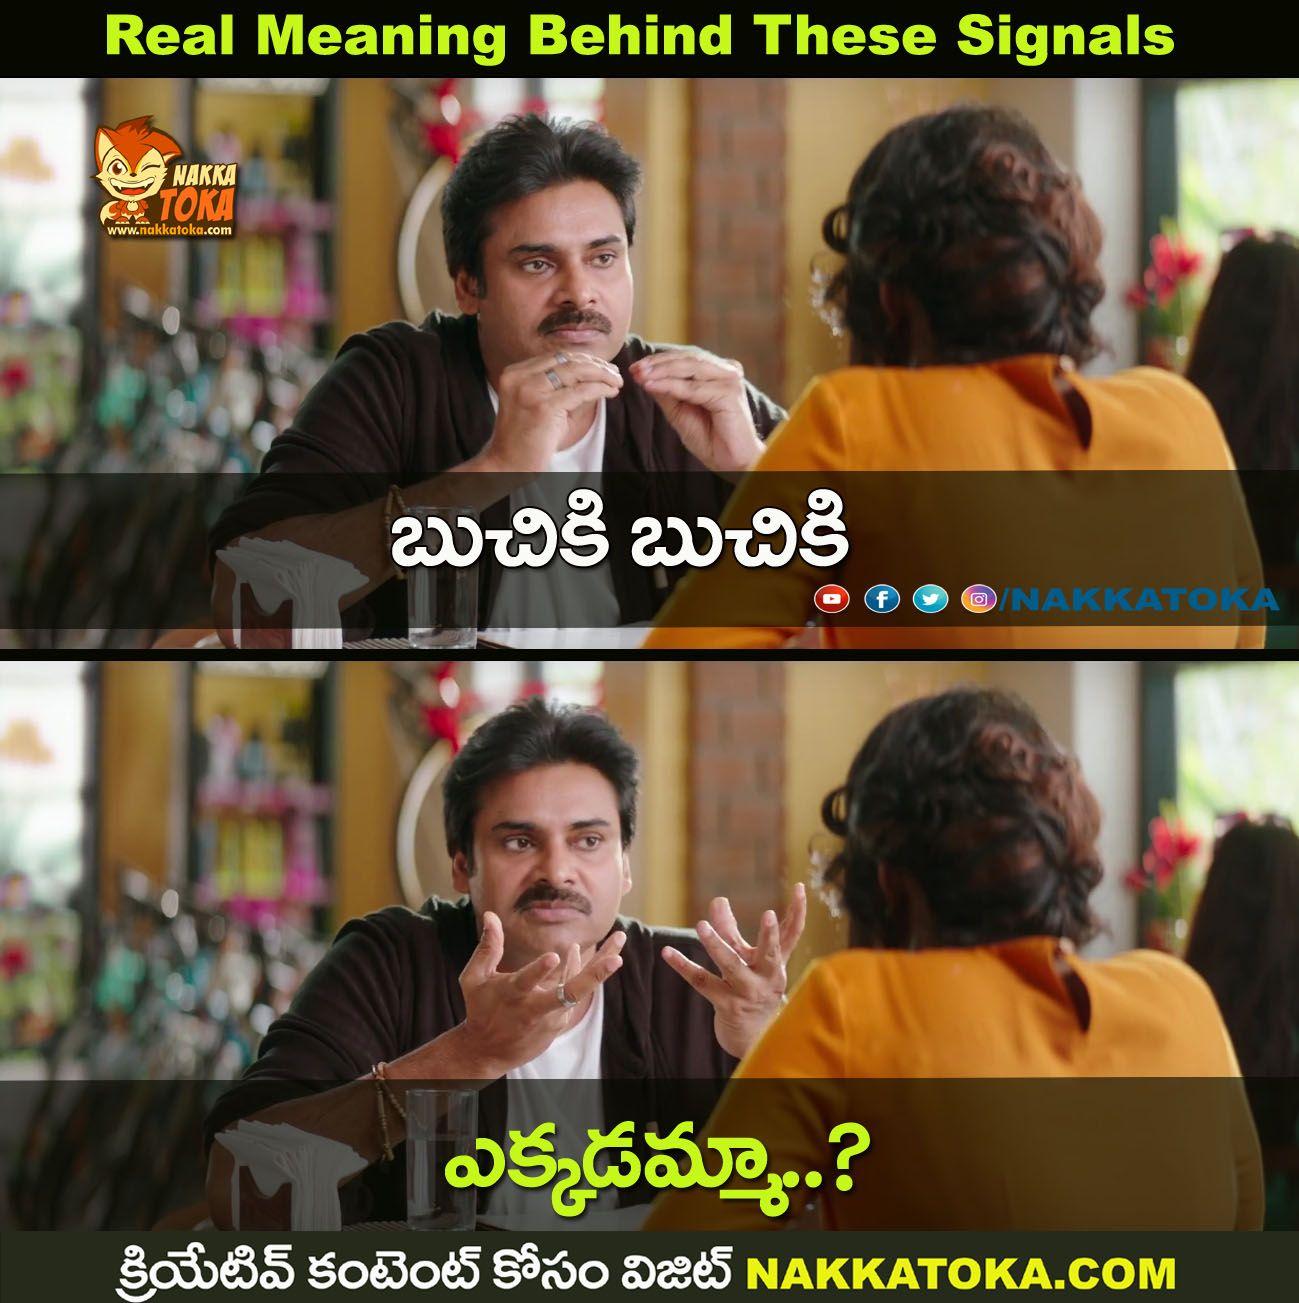 Telugu Memes Memes Telugu Movies Meant To Be